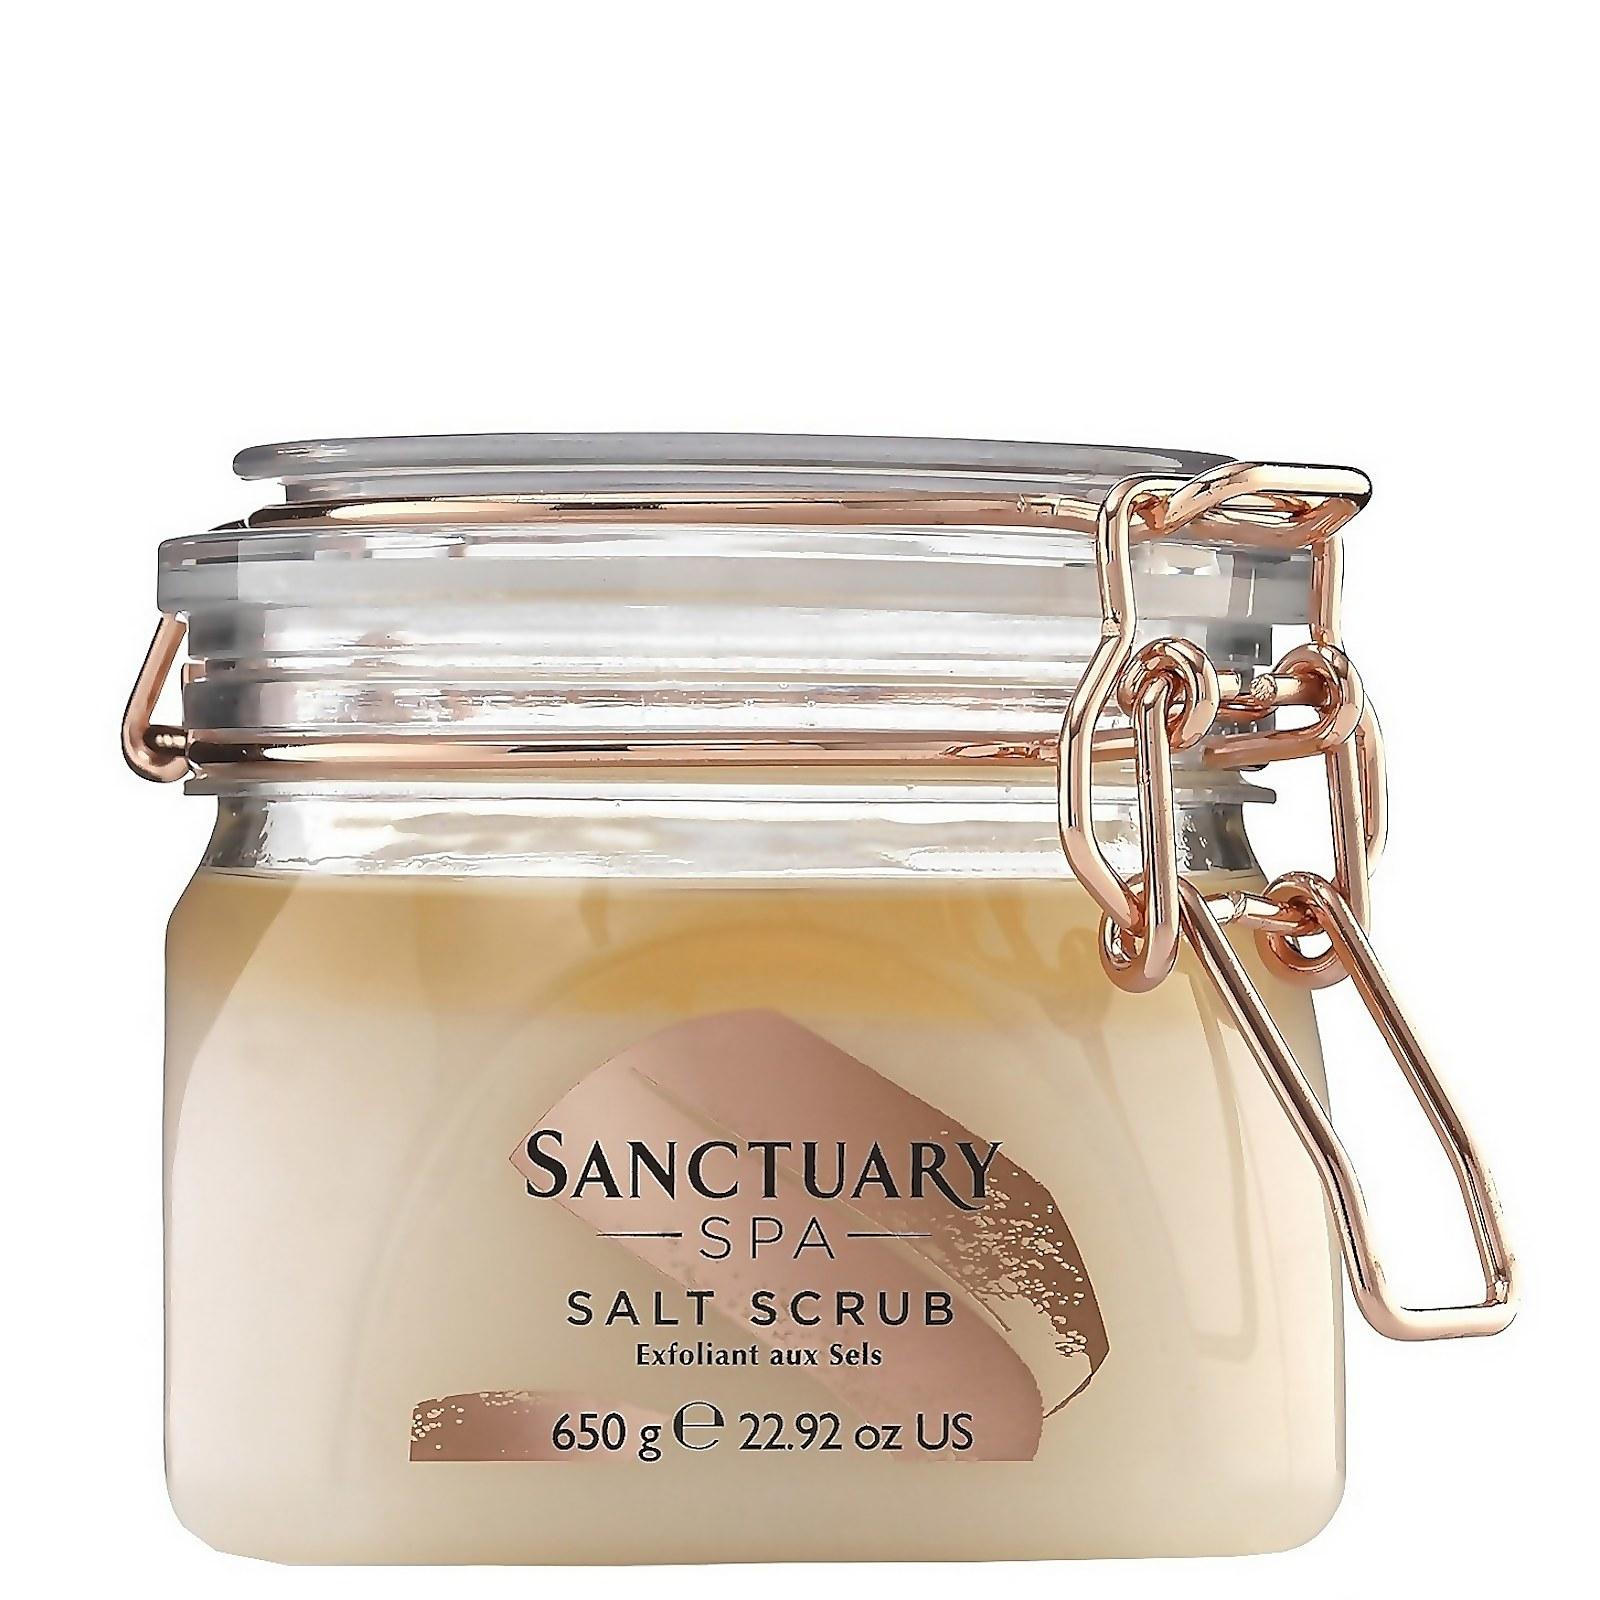 Sanctuary Spa Classic Salt Scrub 650g